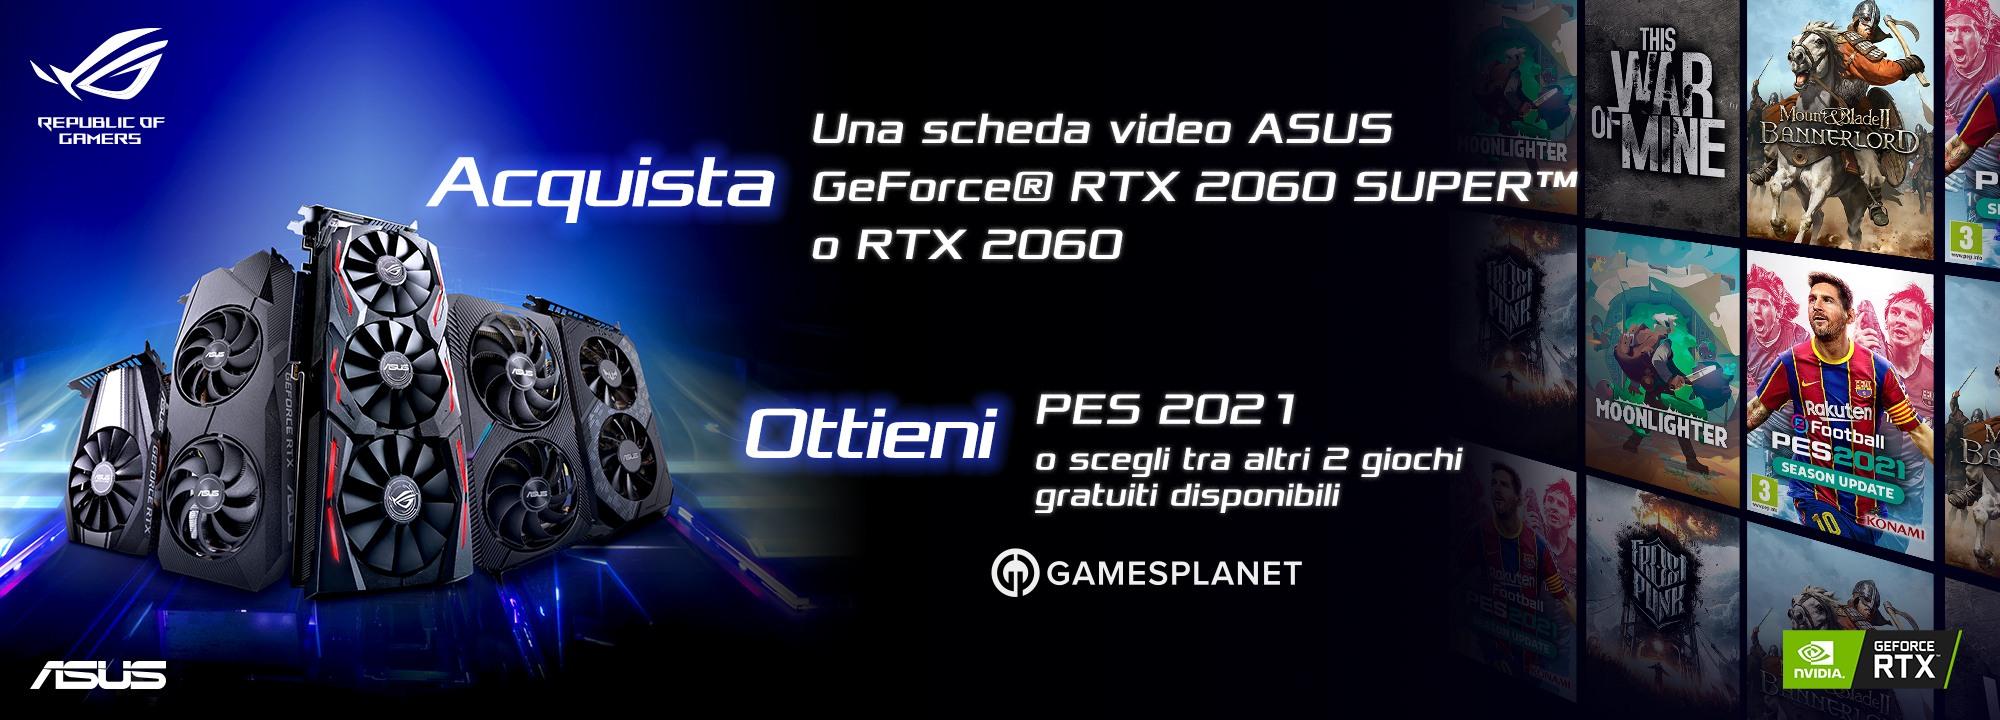 ASUS-gamesplanet-Tech-Princess